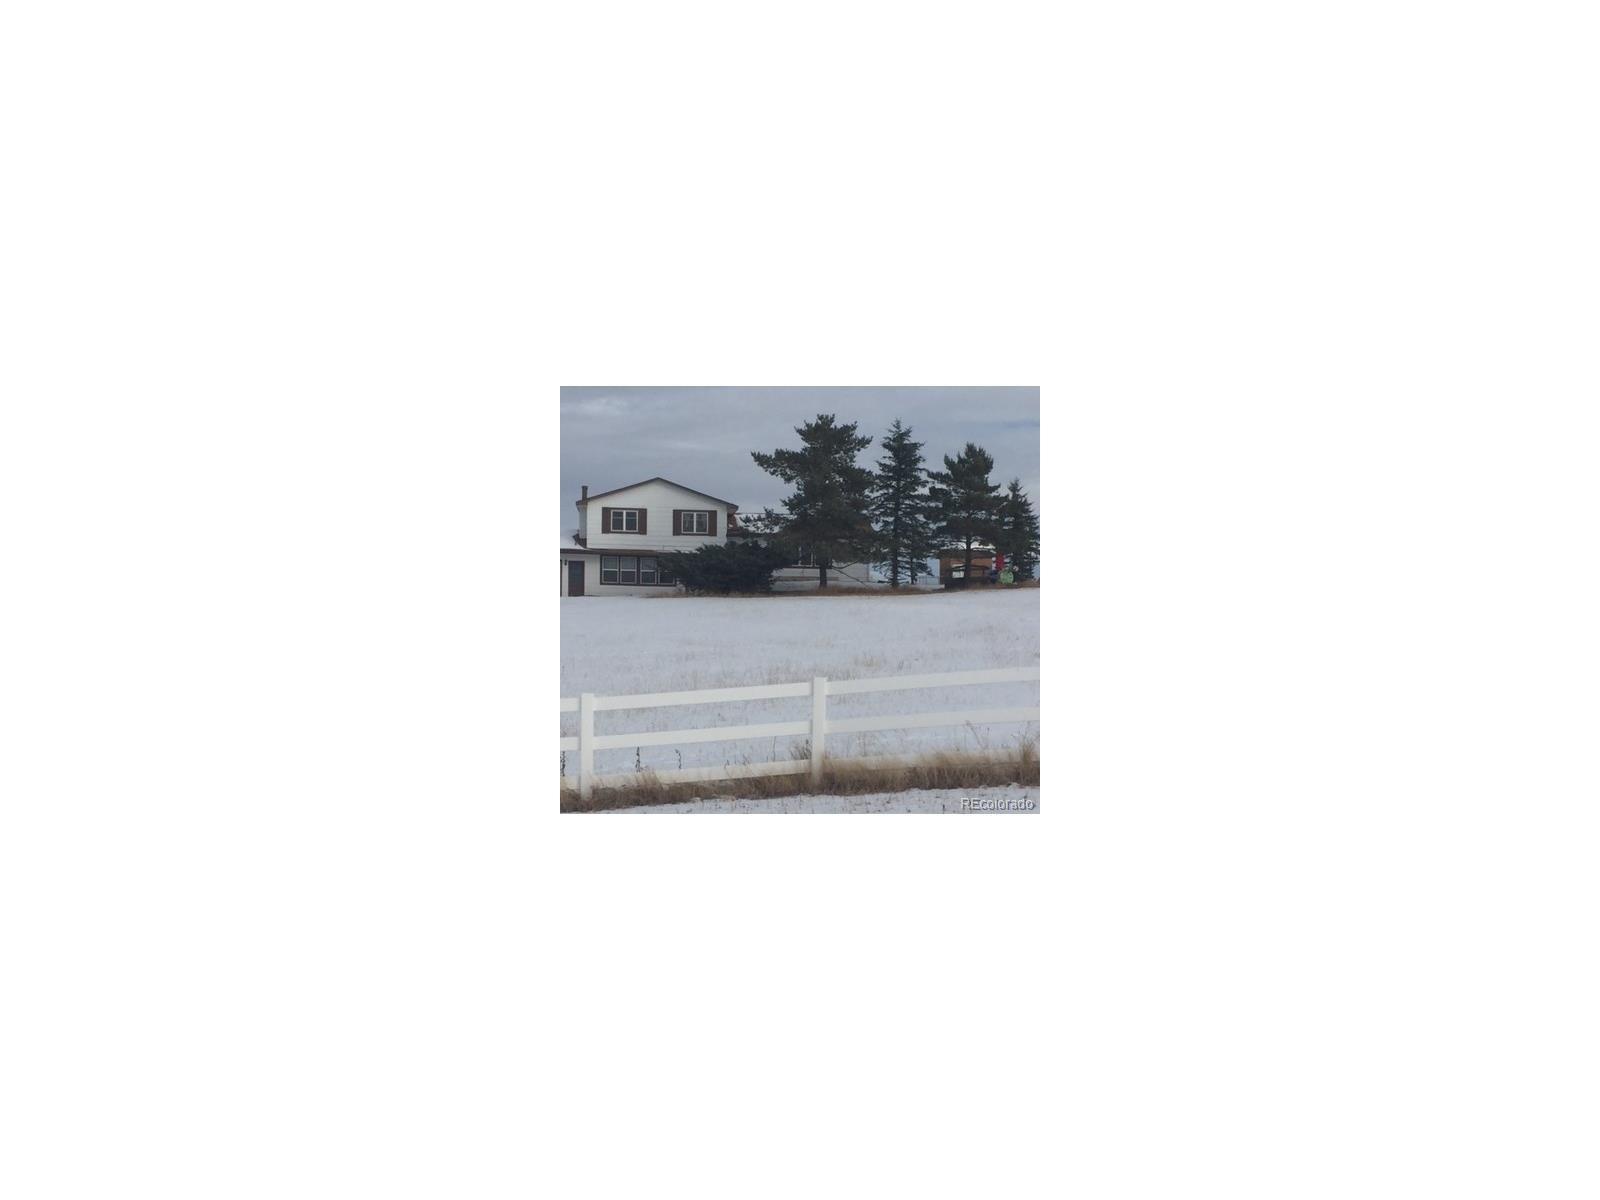 MLS# 8279879 - 1 - 9489 Devils Head Drive, Parker, CO 80138